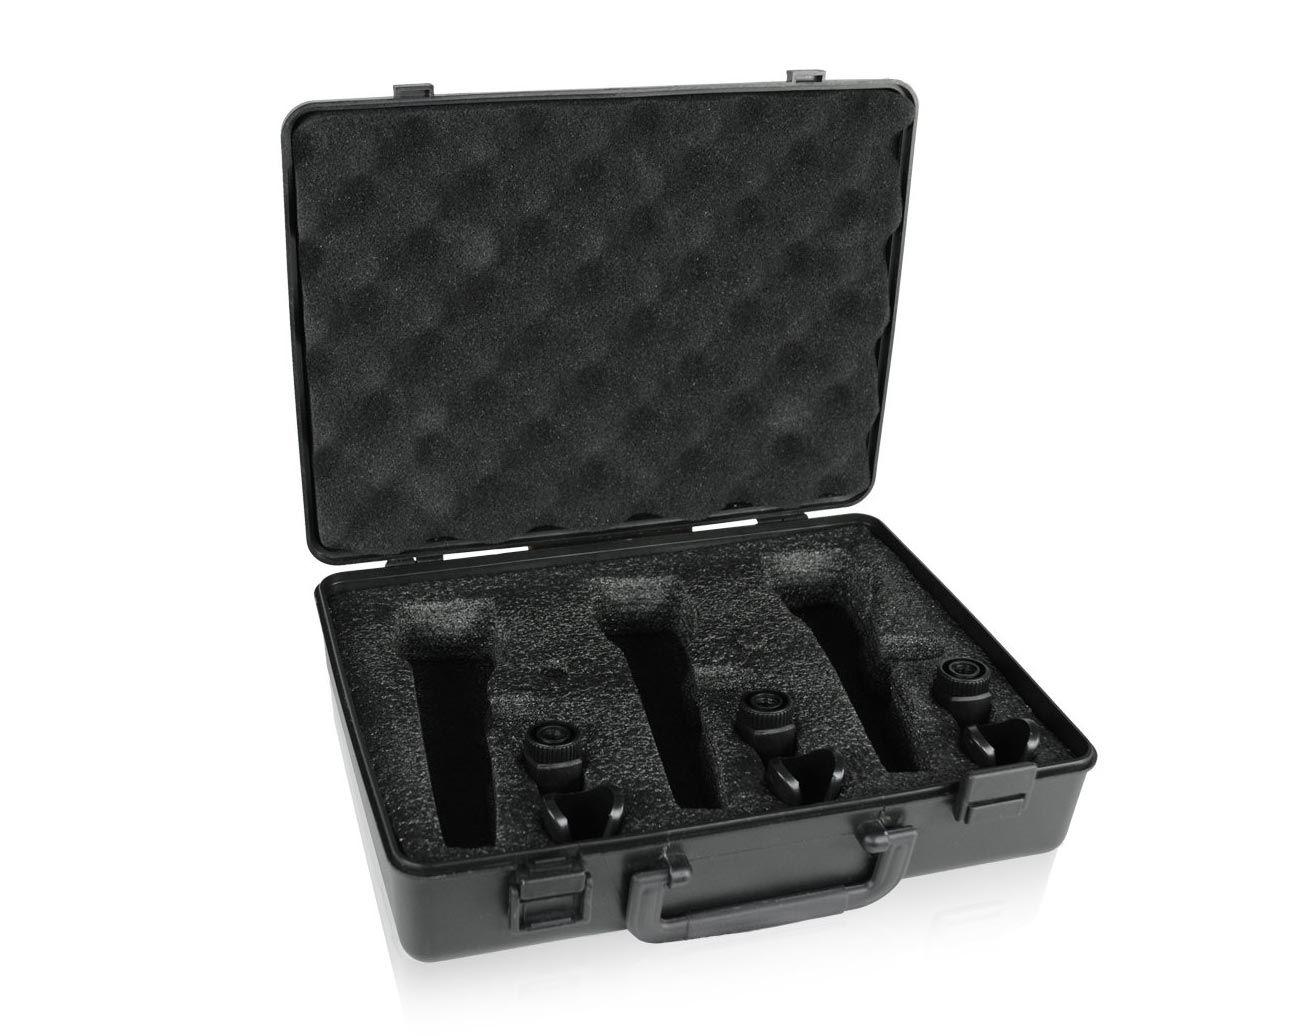 KIT c/ 3 Microfones Dinâmicos Behringer XM1800S + CASE - NOTA FISCAL